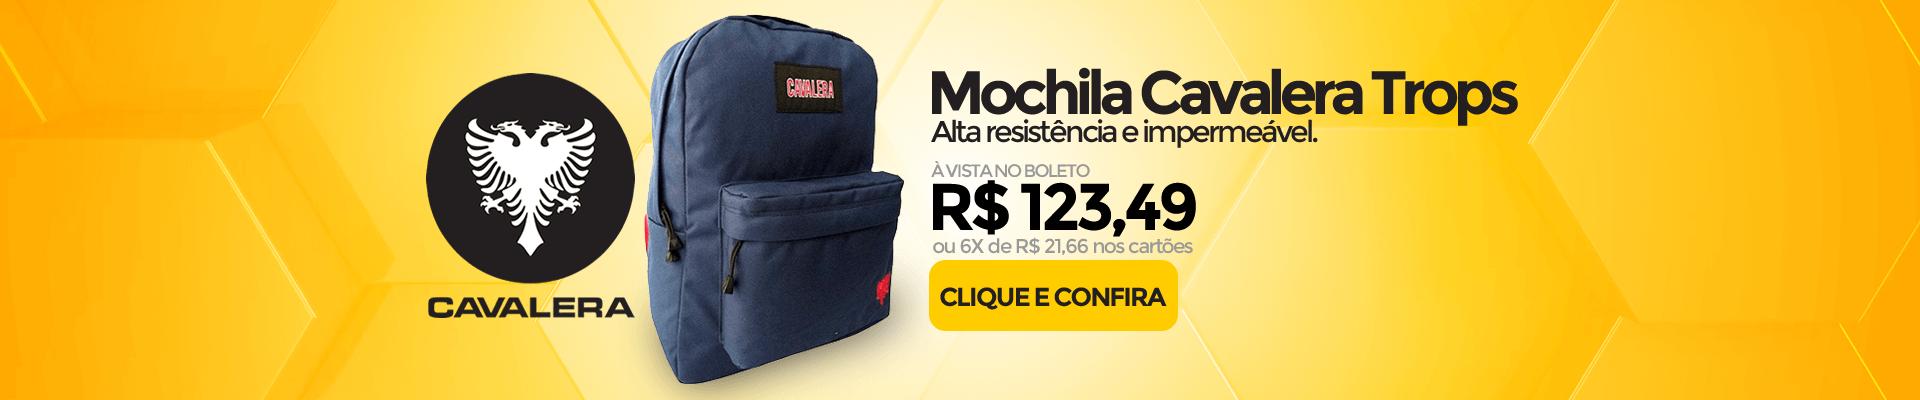 Banner Mochila Cavalera